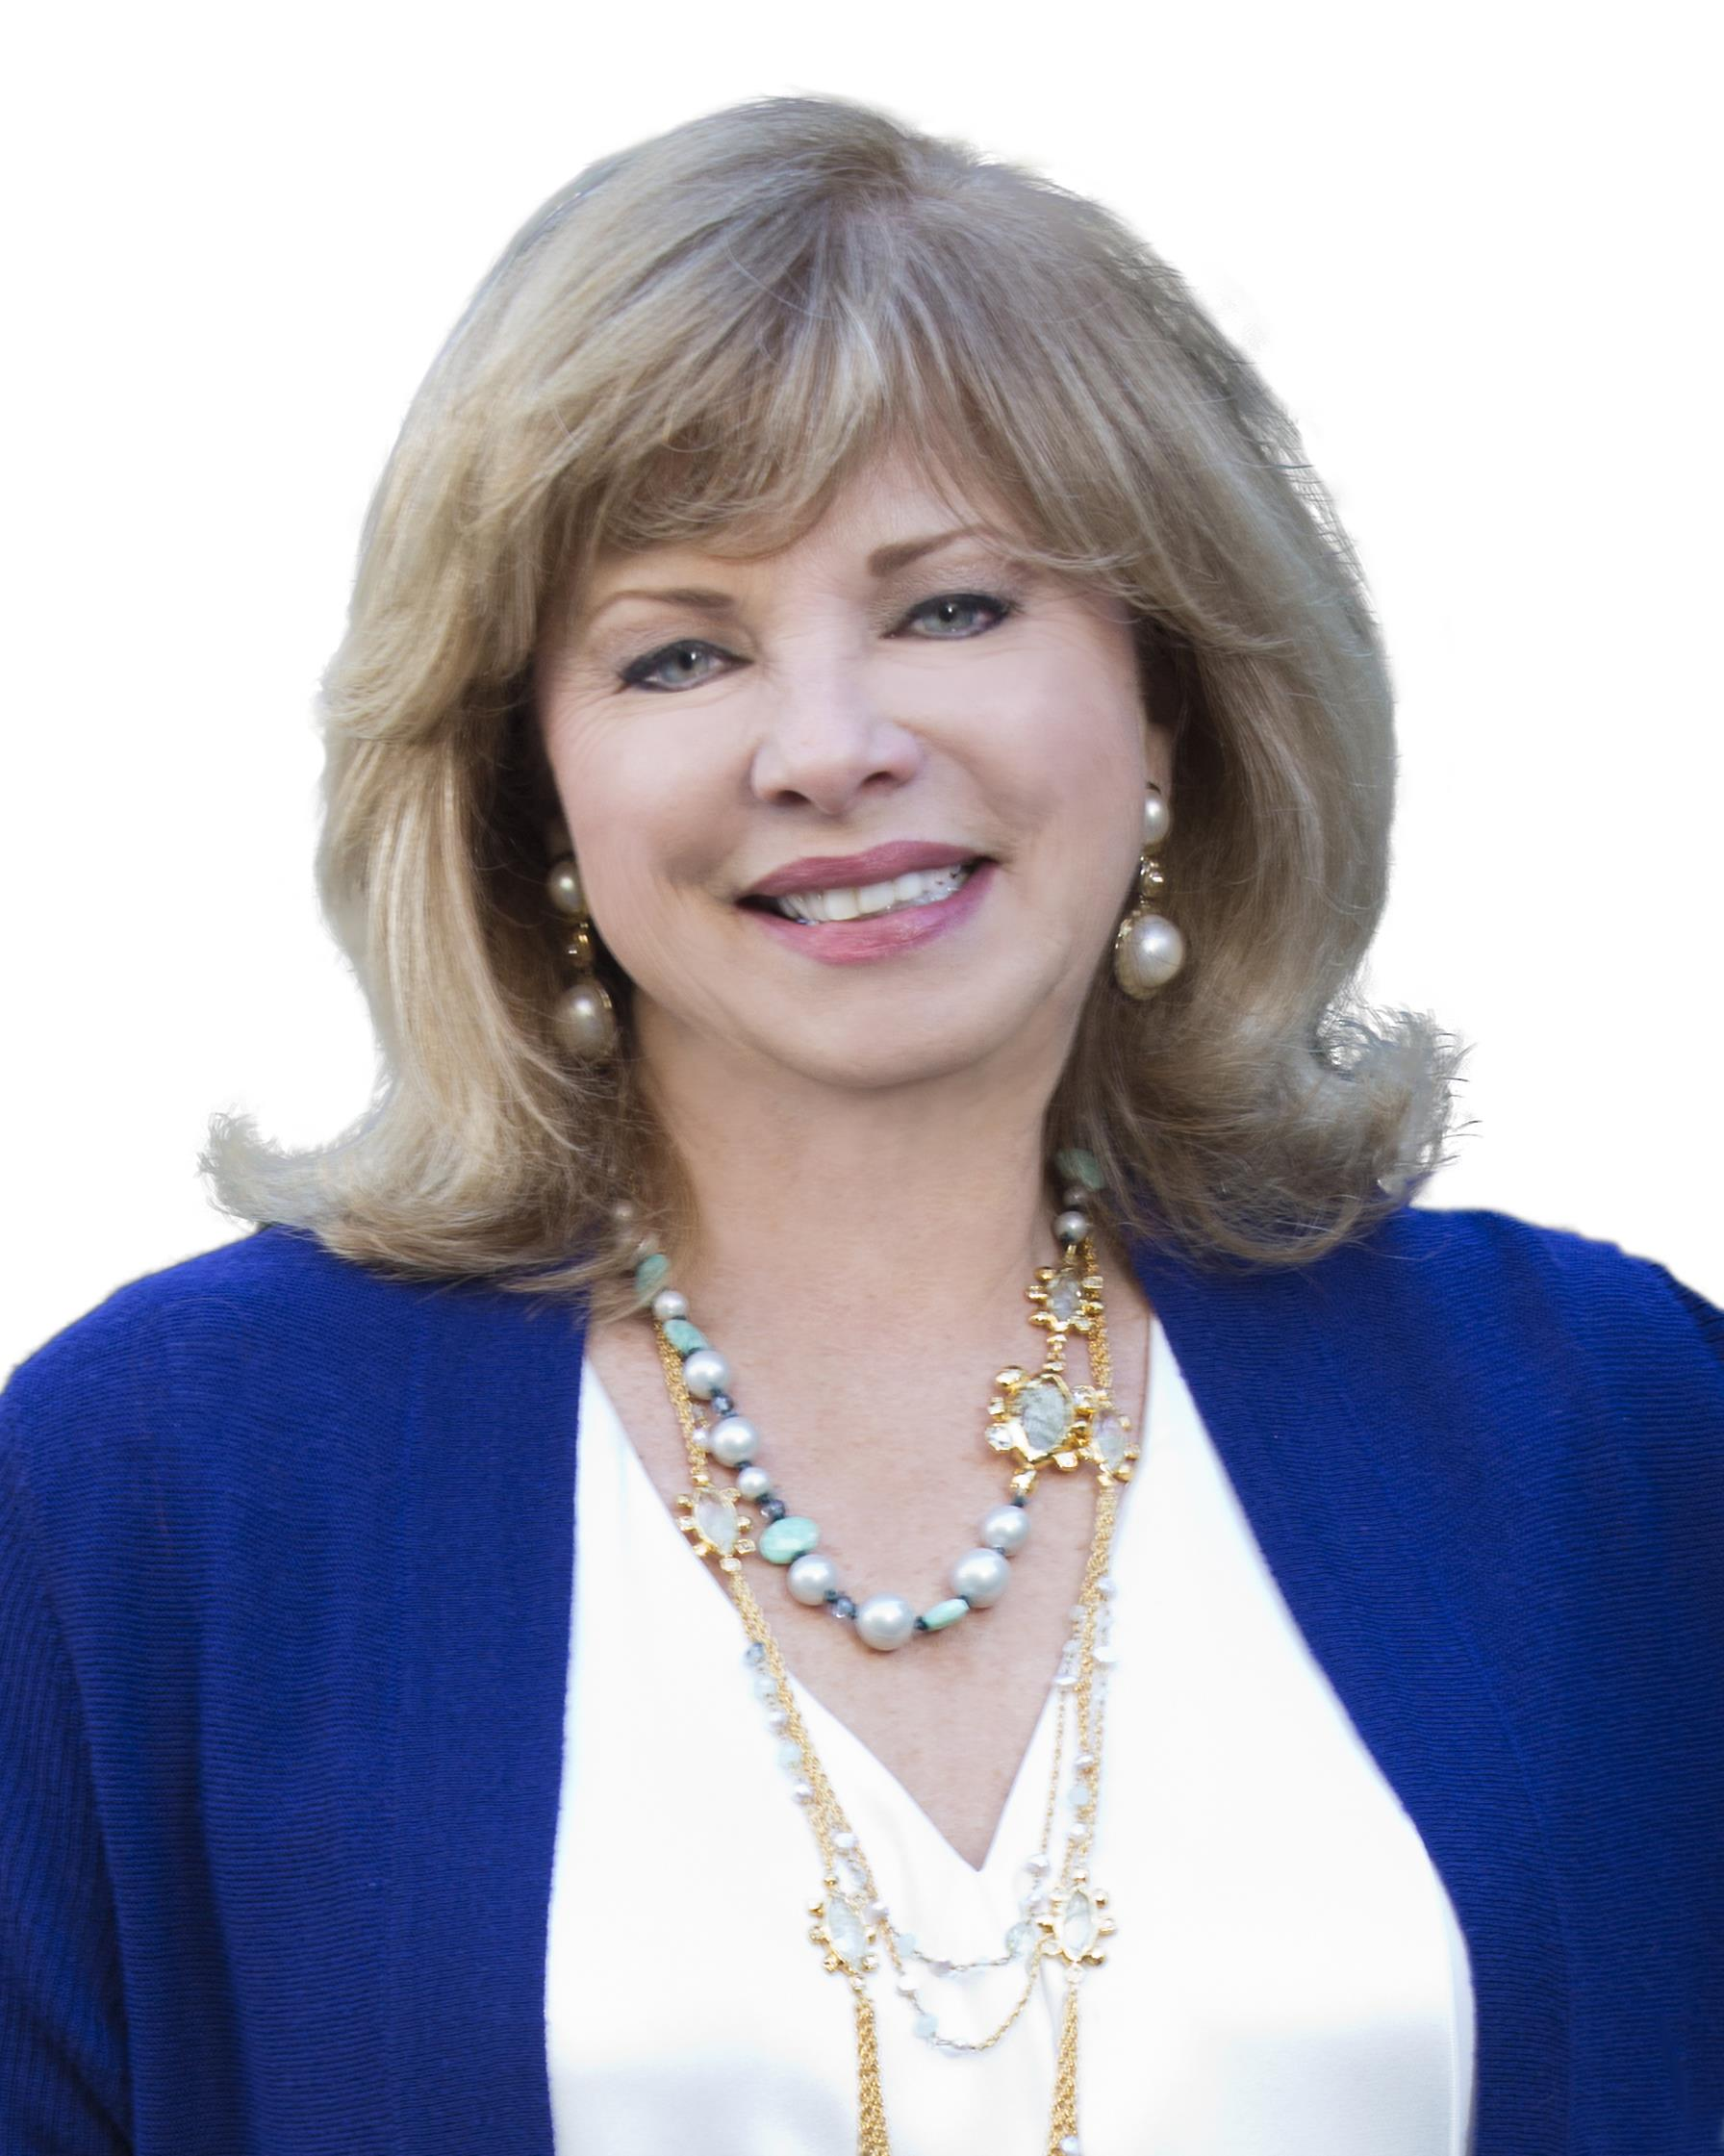 Brenda Sandoz